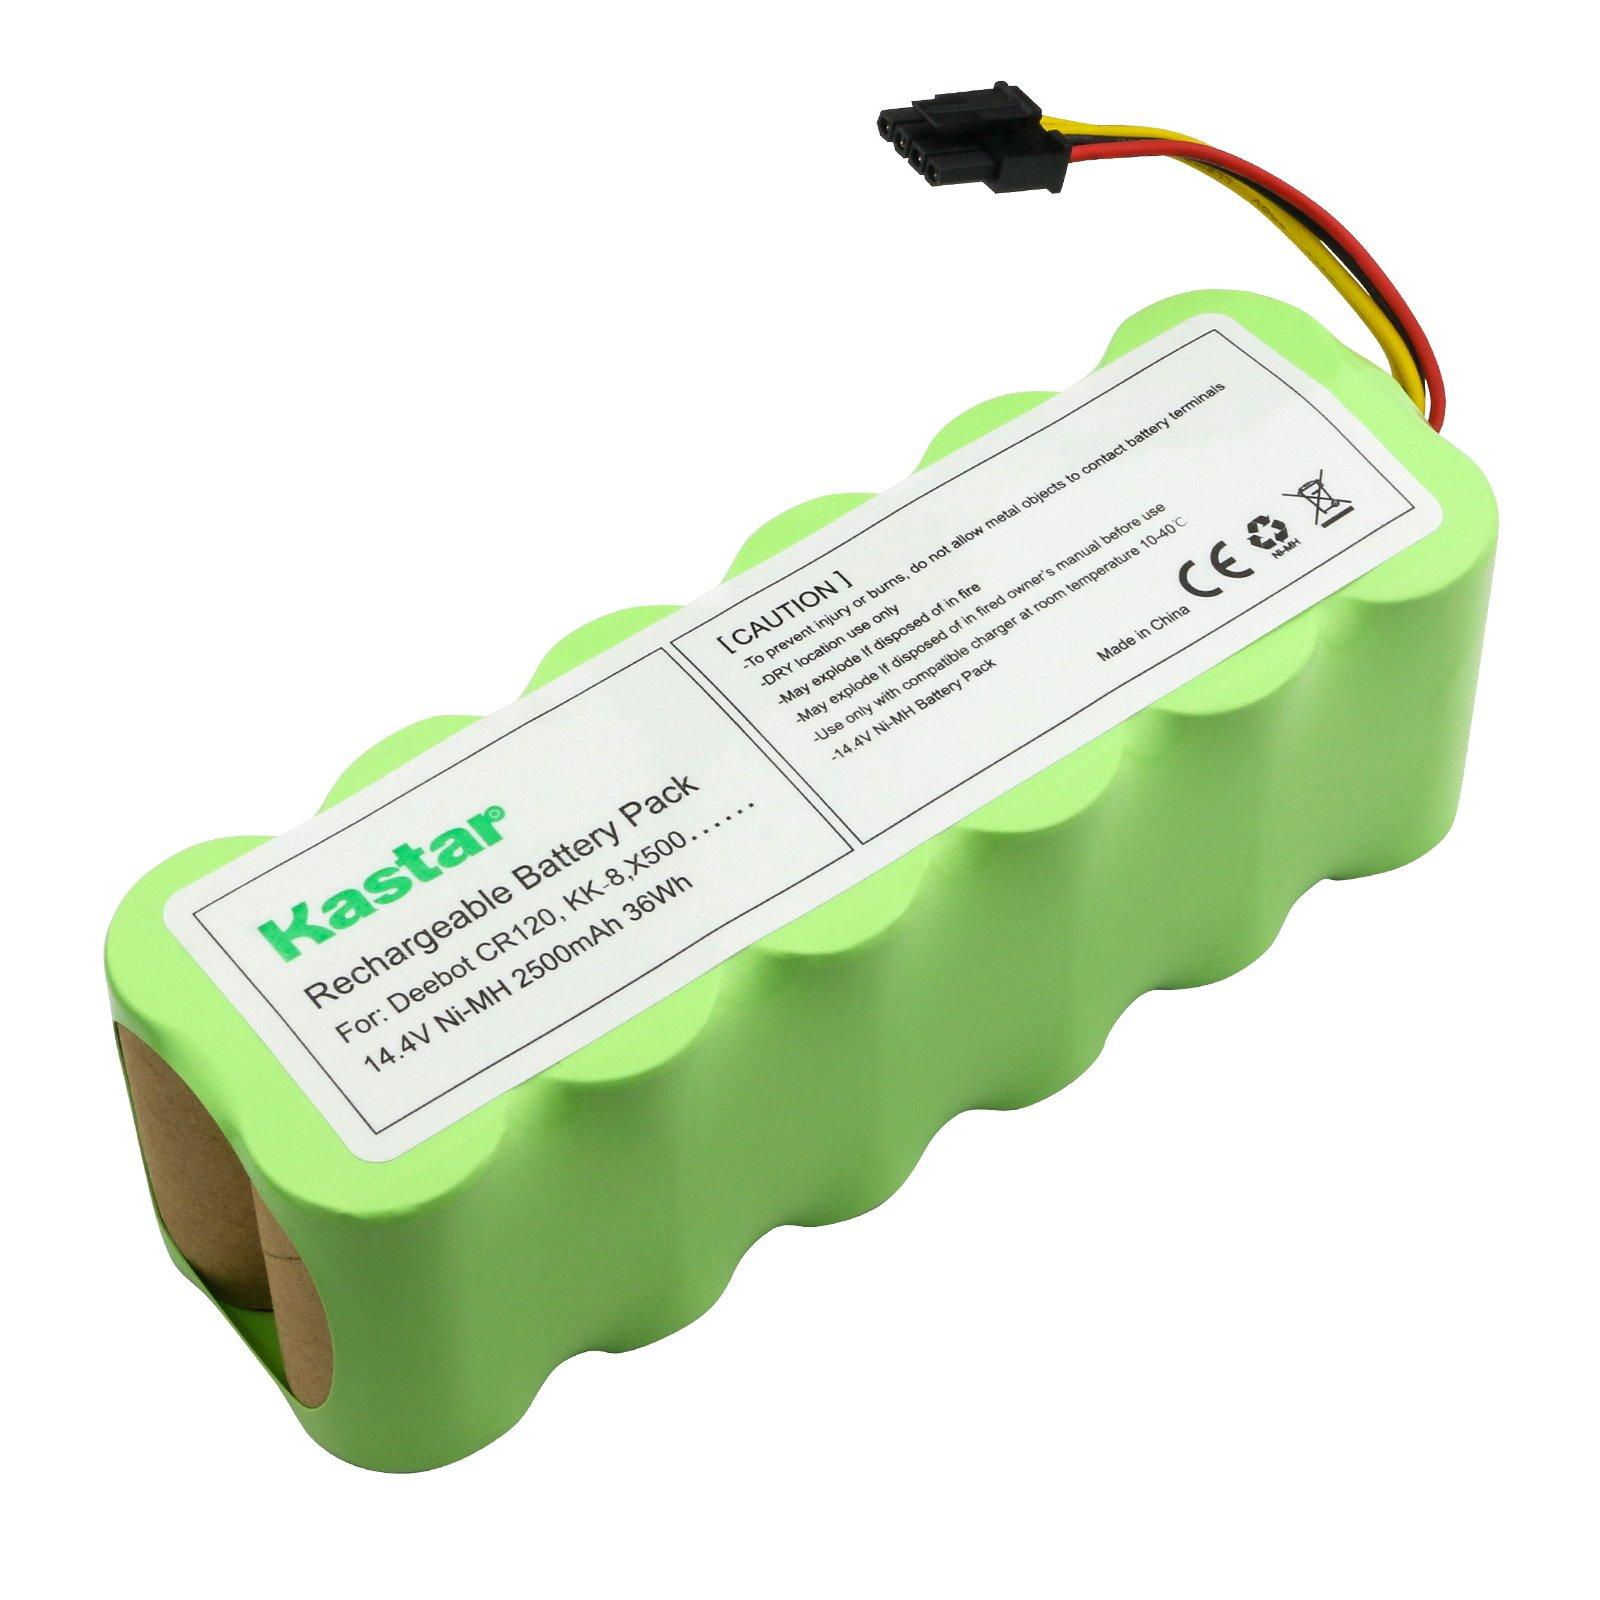 Kastar CR120 Battery (1 Pack), Ni-MH 14.4V 2500mAh, Replacement for Deebot CR120, KK-8, ECOVACS X500, LP43SC2000P